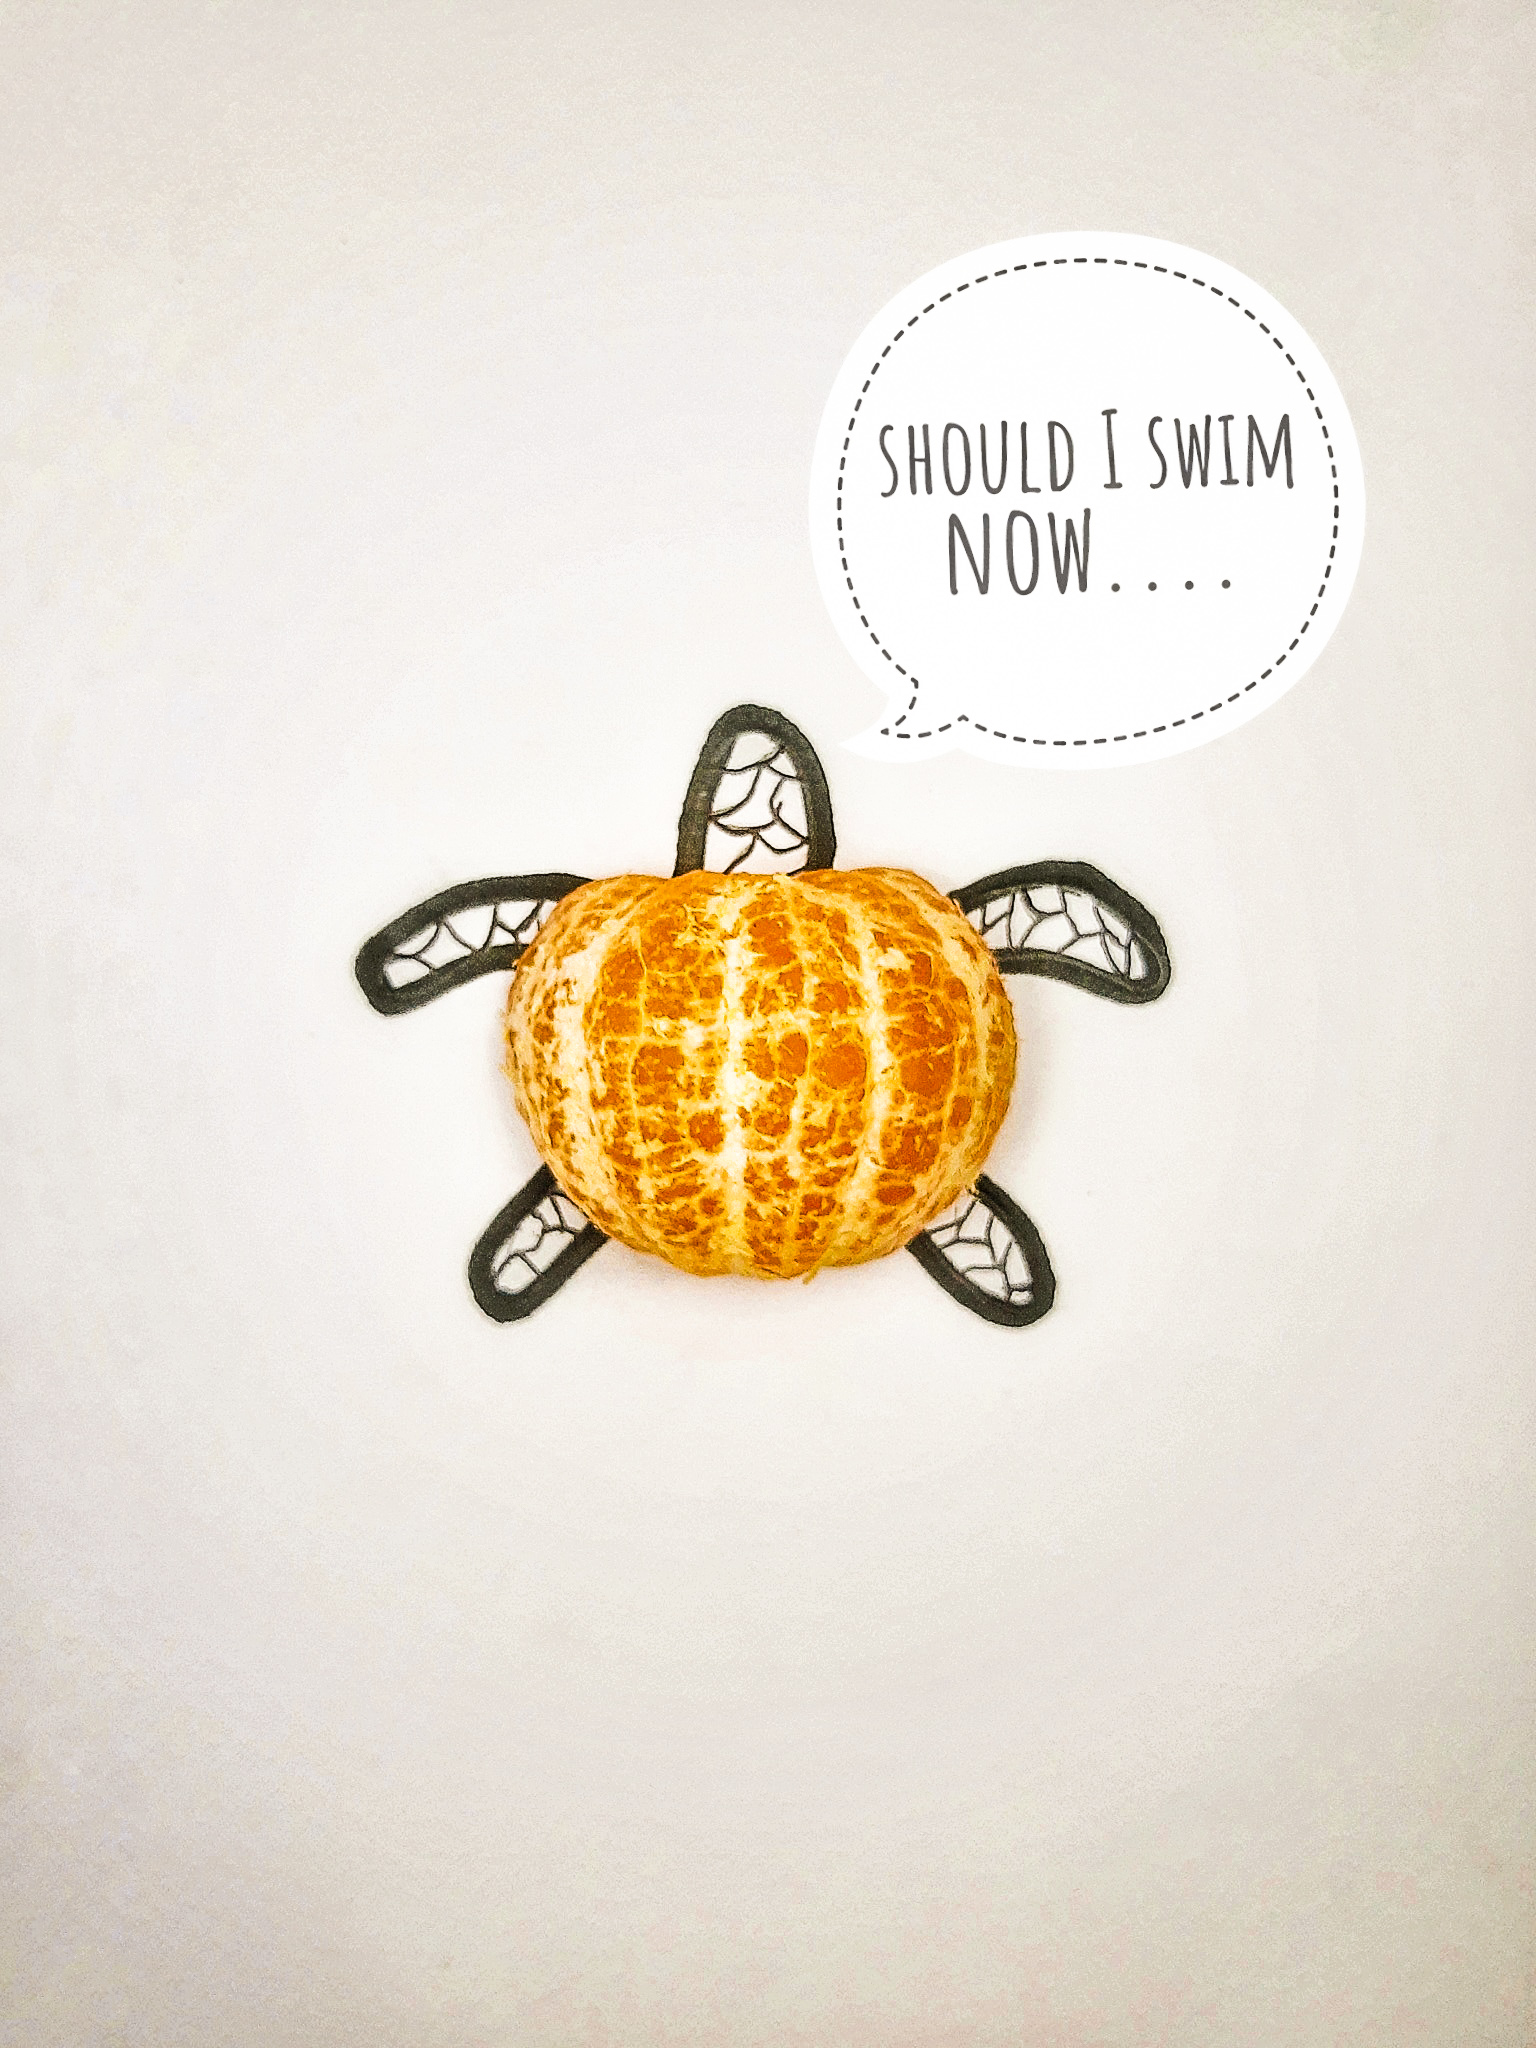 A peeled orange